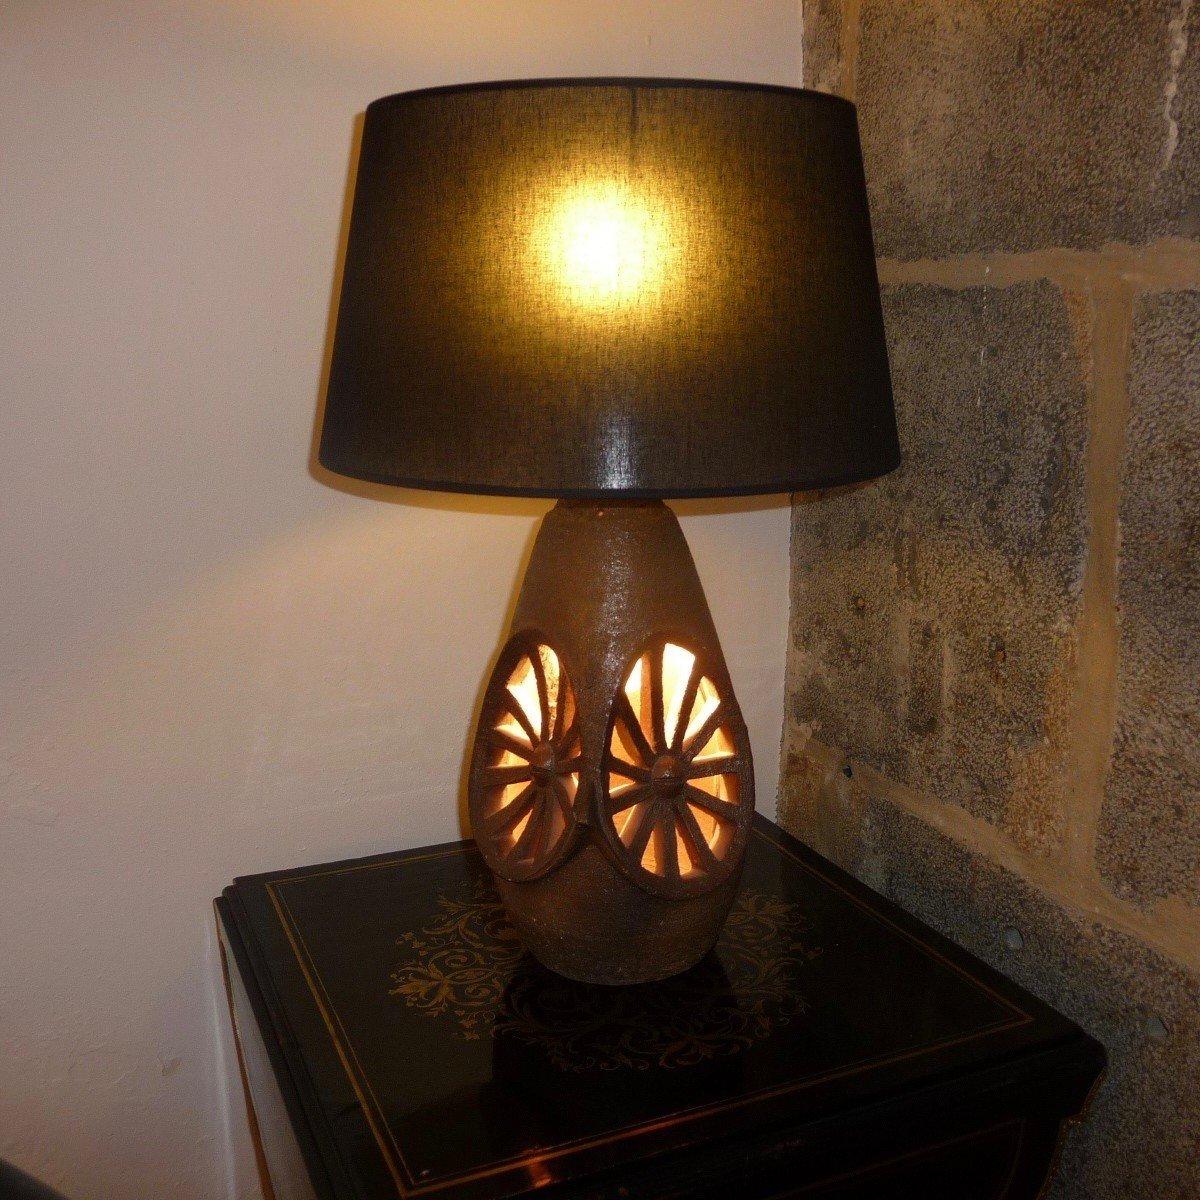 Vallauris Keramiklampe von Musarra, 1950er